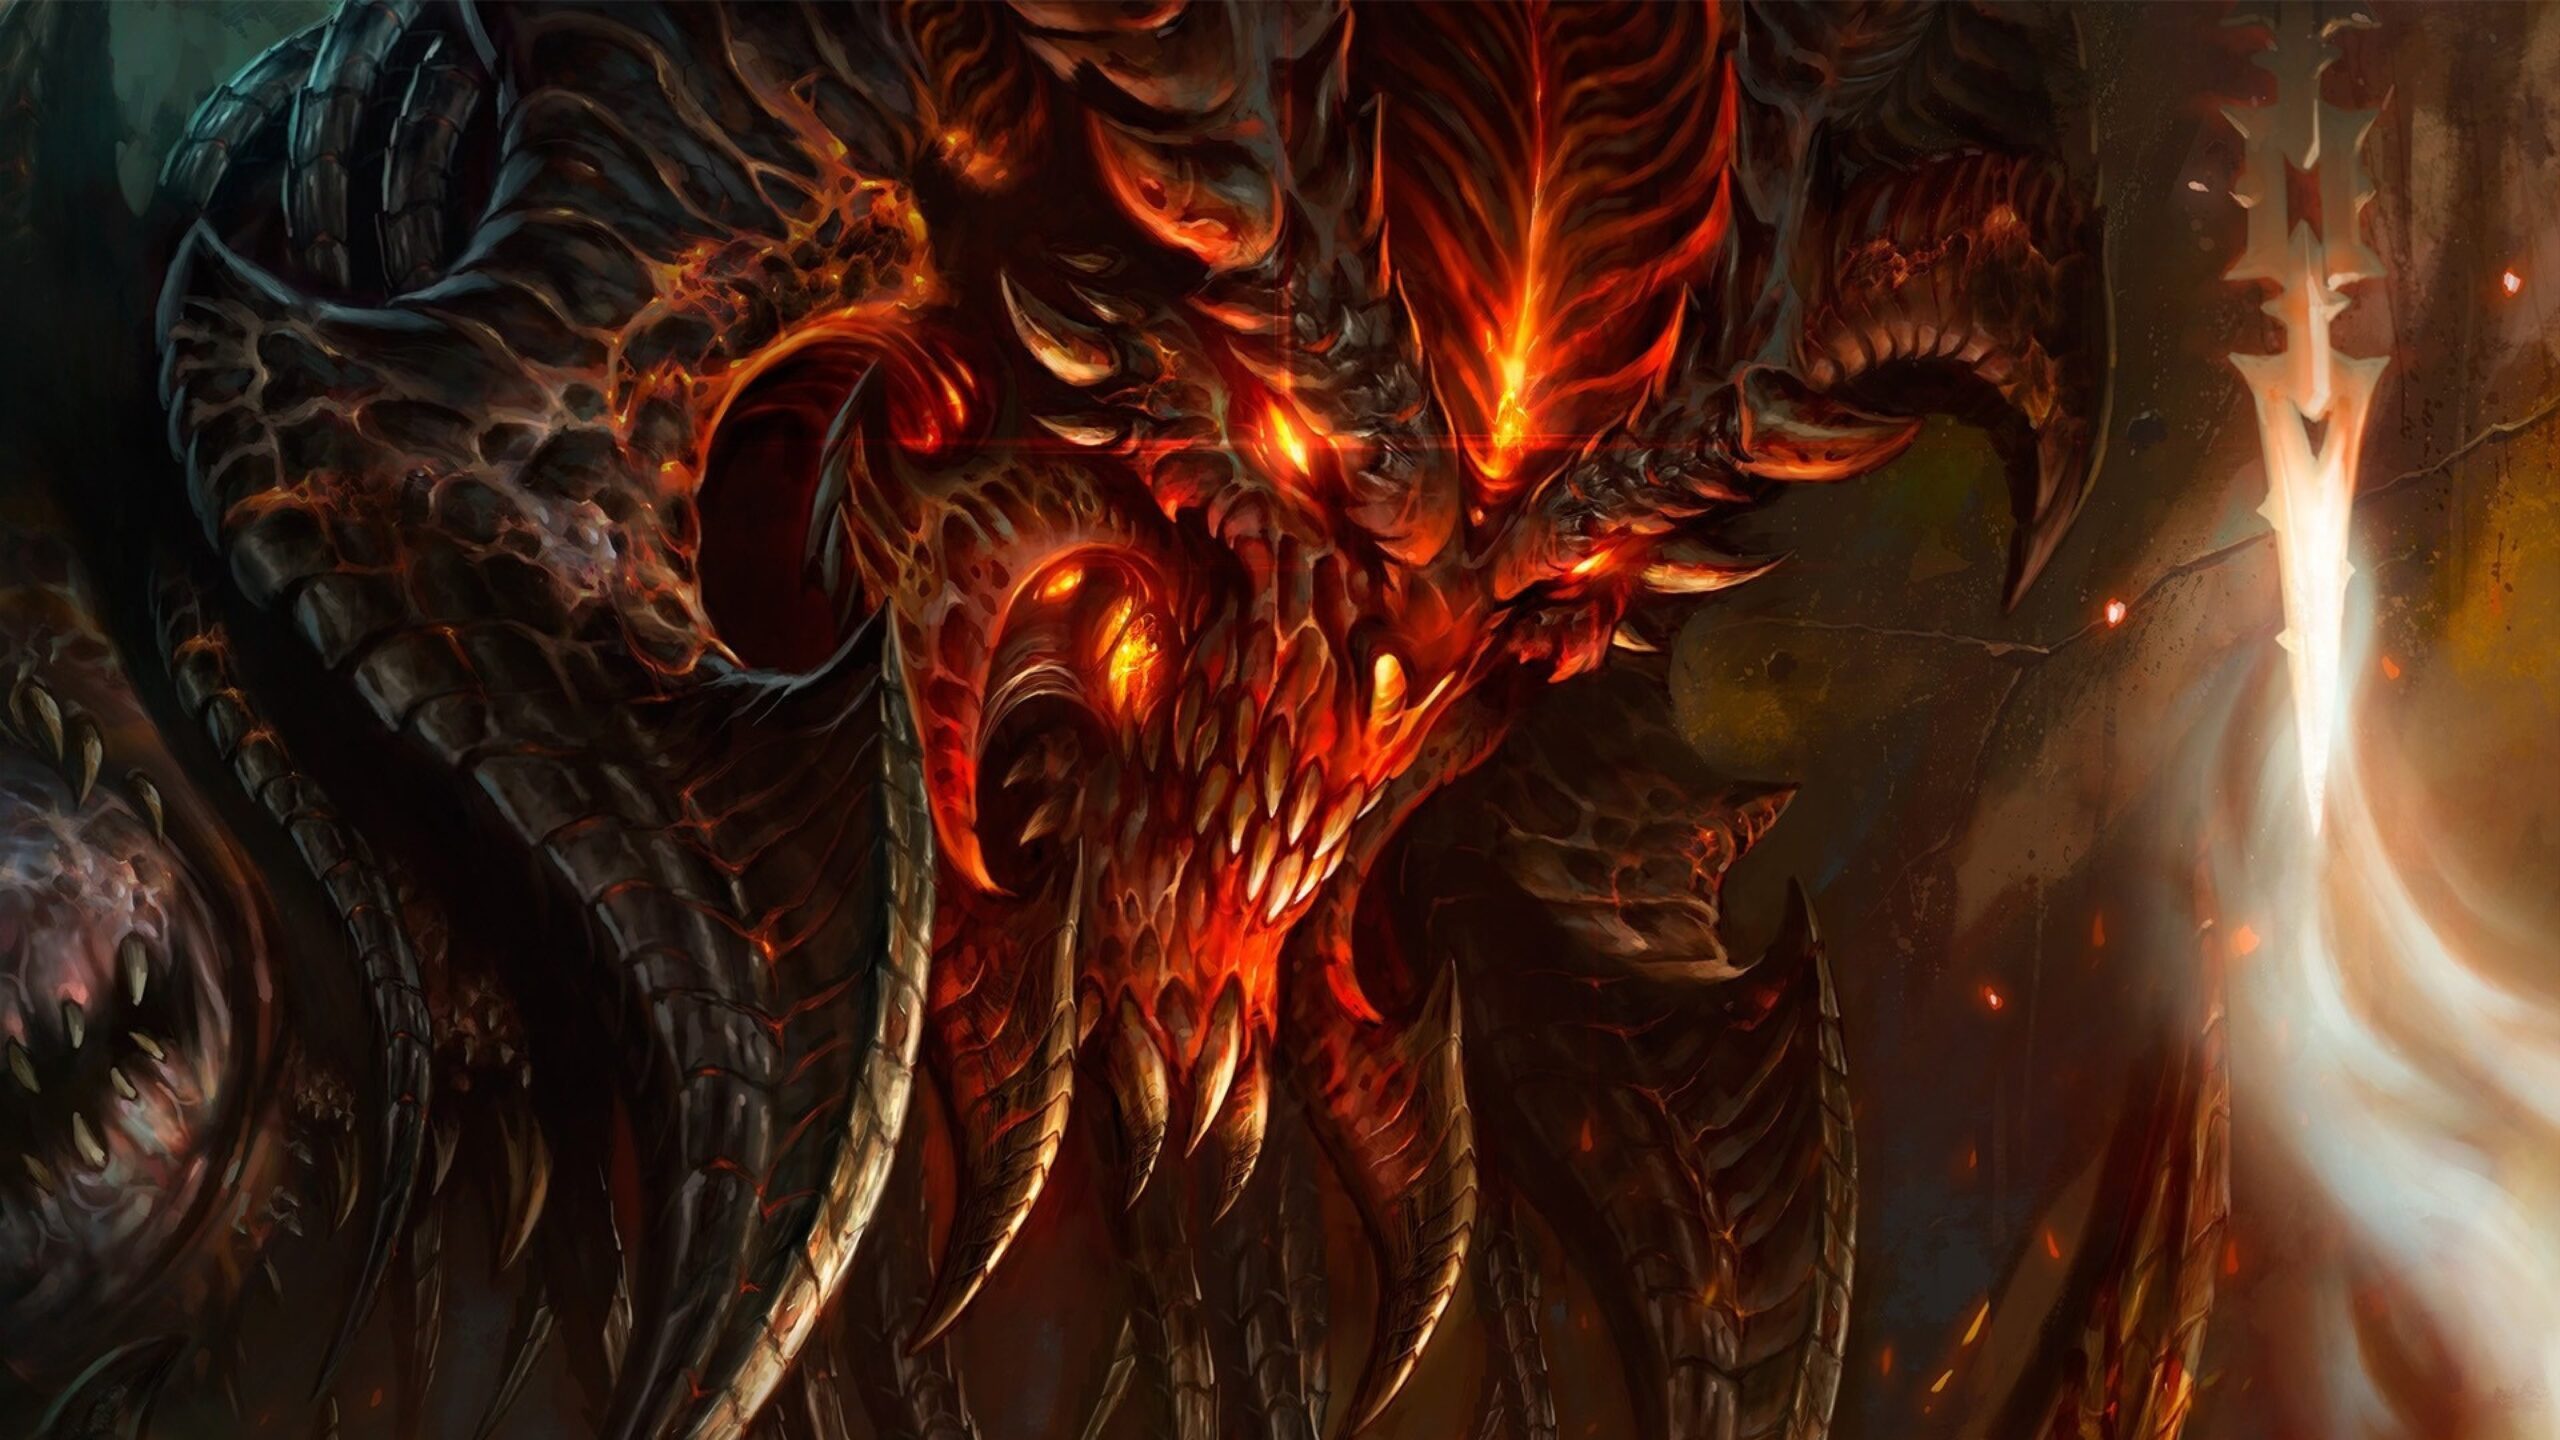 Blizzard Commenta I Rumors Riguardanti Diablo 4 1 - Hynerd.it